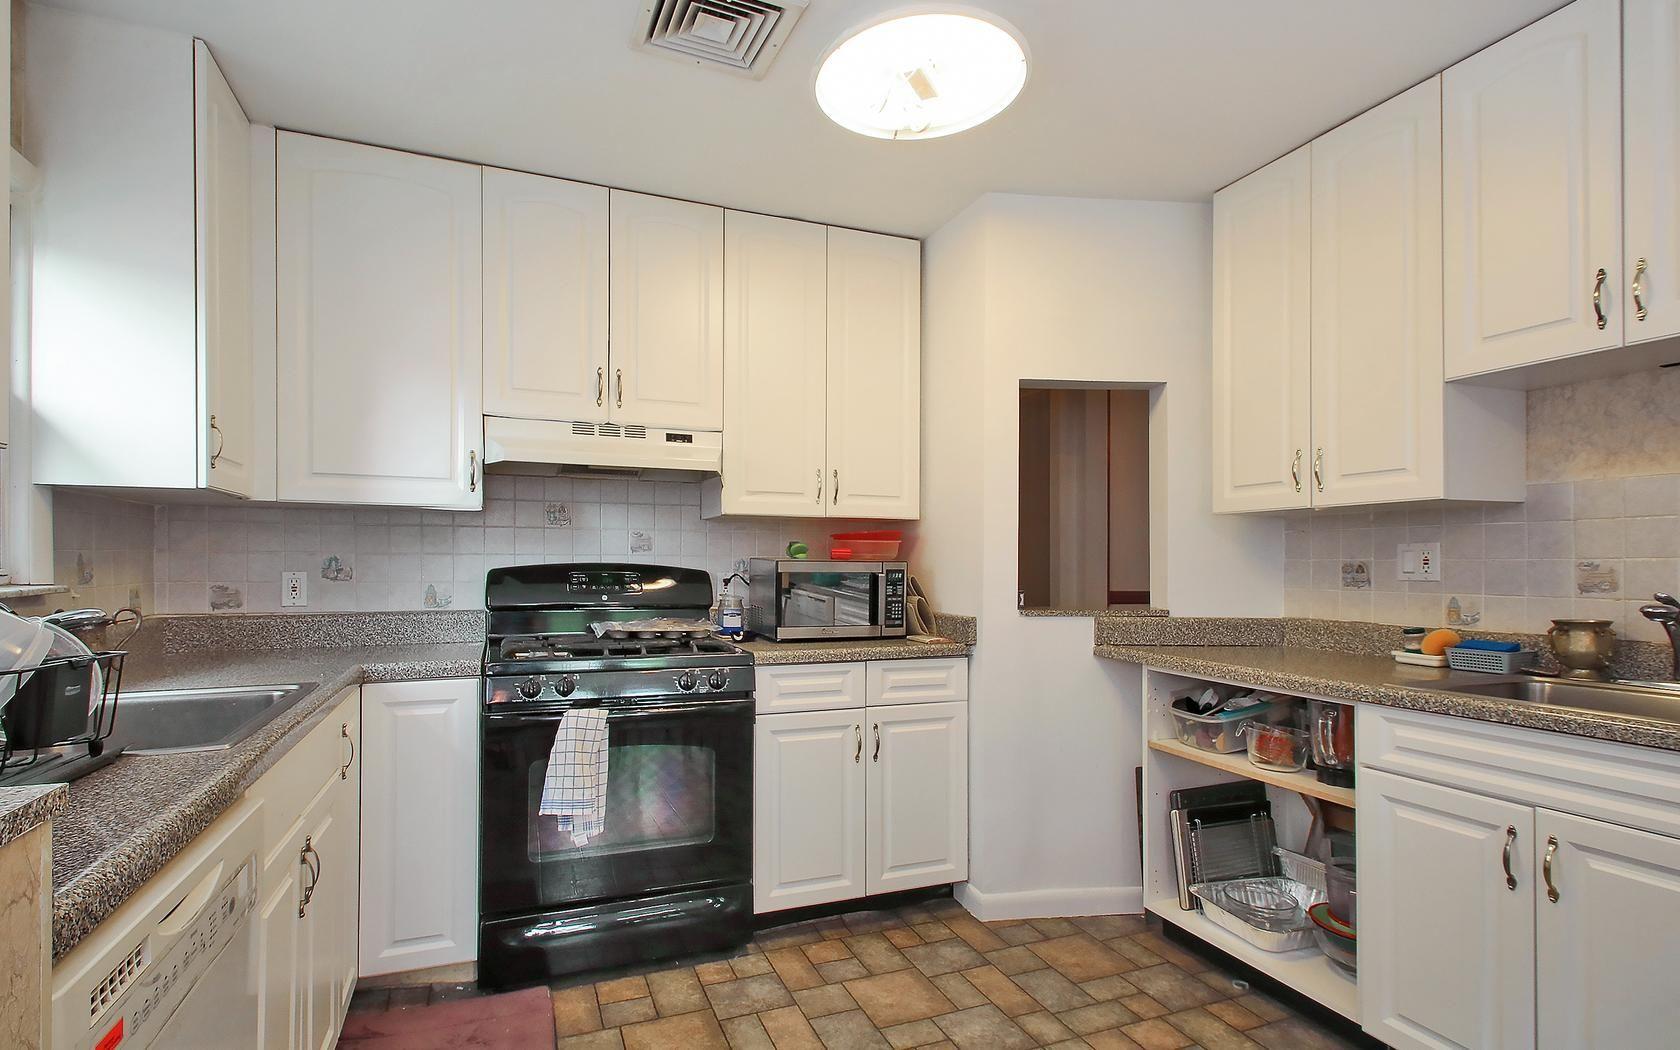 Master bedroom kitchenette  kitchen cooking appliances stove cabinets   Sunrise Ter